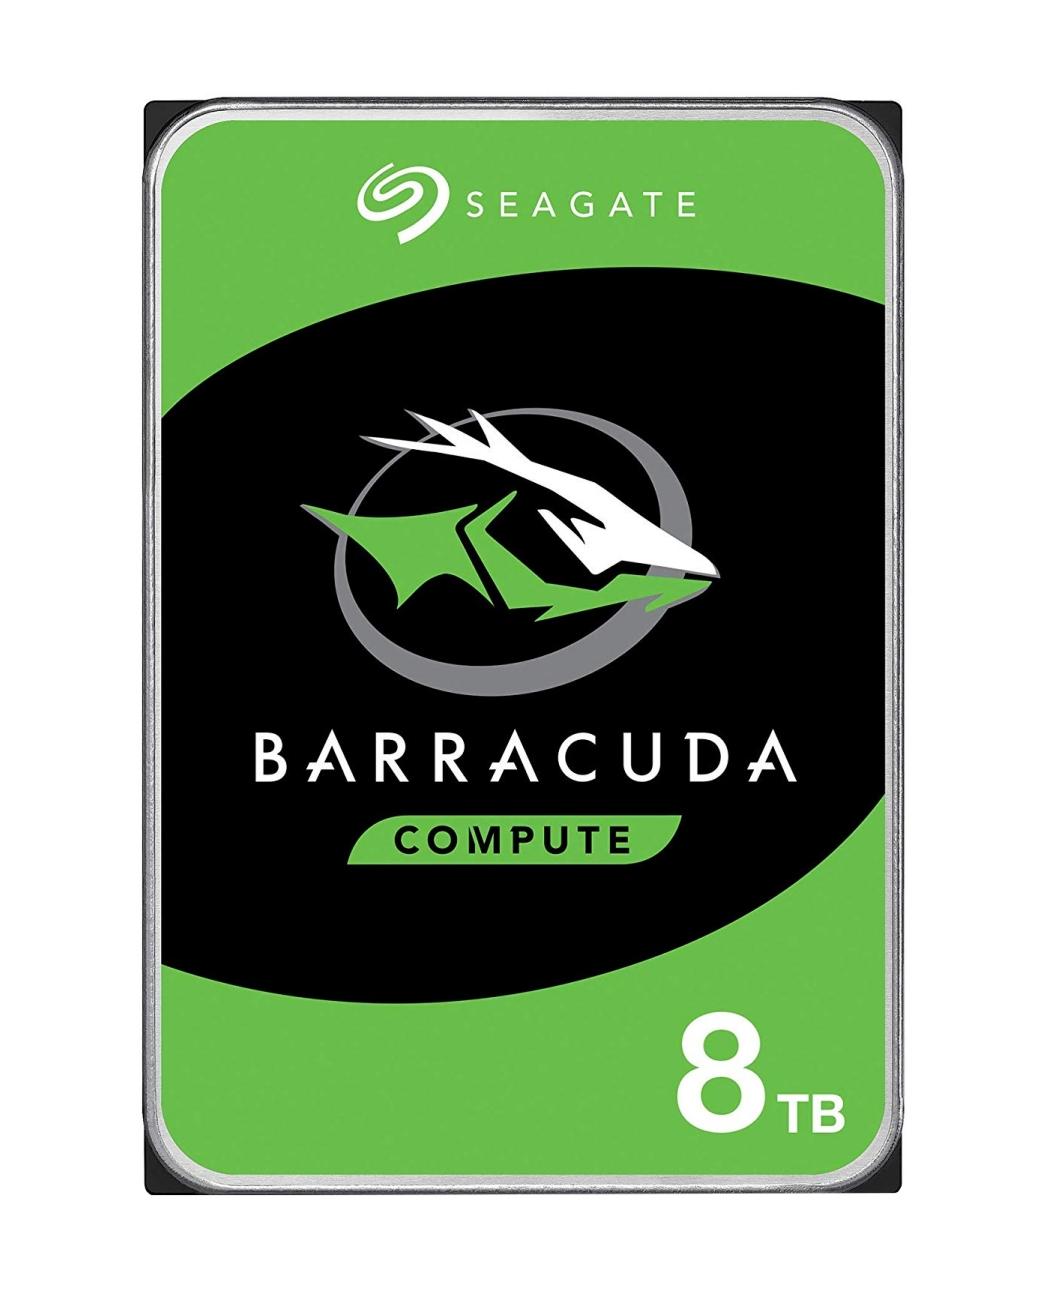 "Seagate Barracuda ST8000DM004 internal hard drive 3.5"" 8000 GB Serial ATA III"